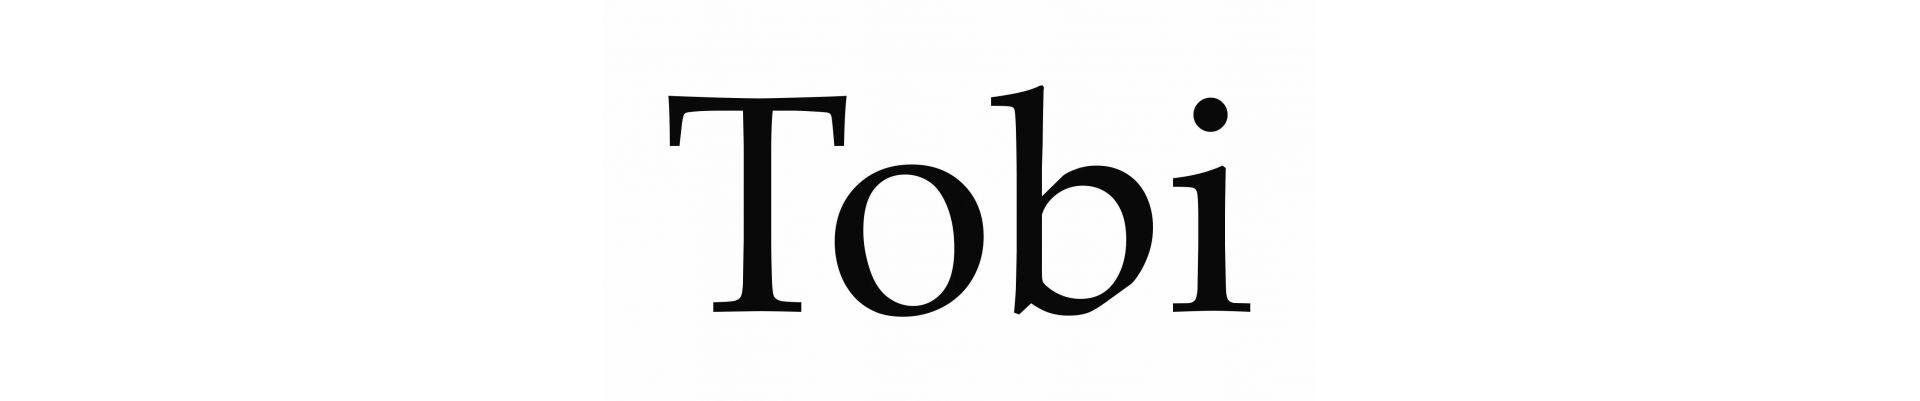 Magazin online cu filtre pentru tigari Tobi de vanzare.Pret filtre Tobi